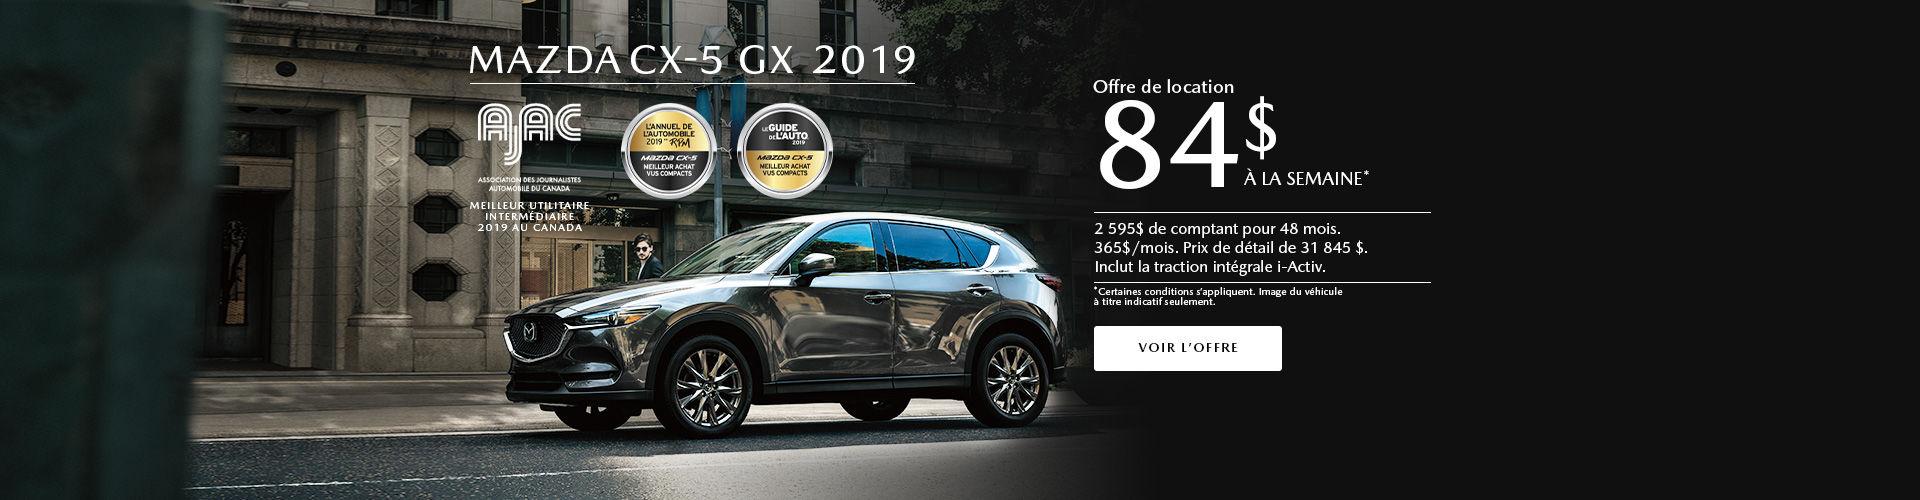 Mazda CX-5 Promotion